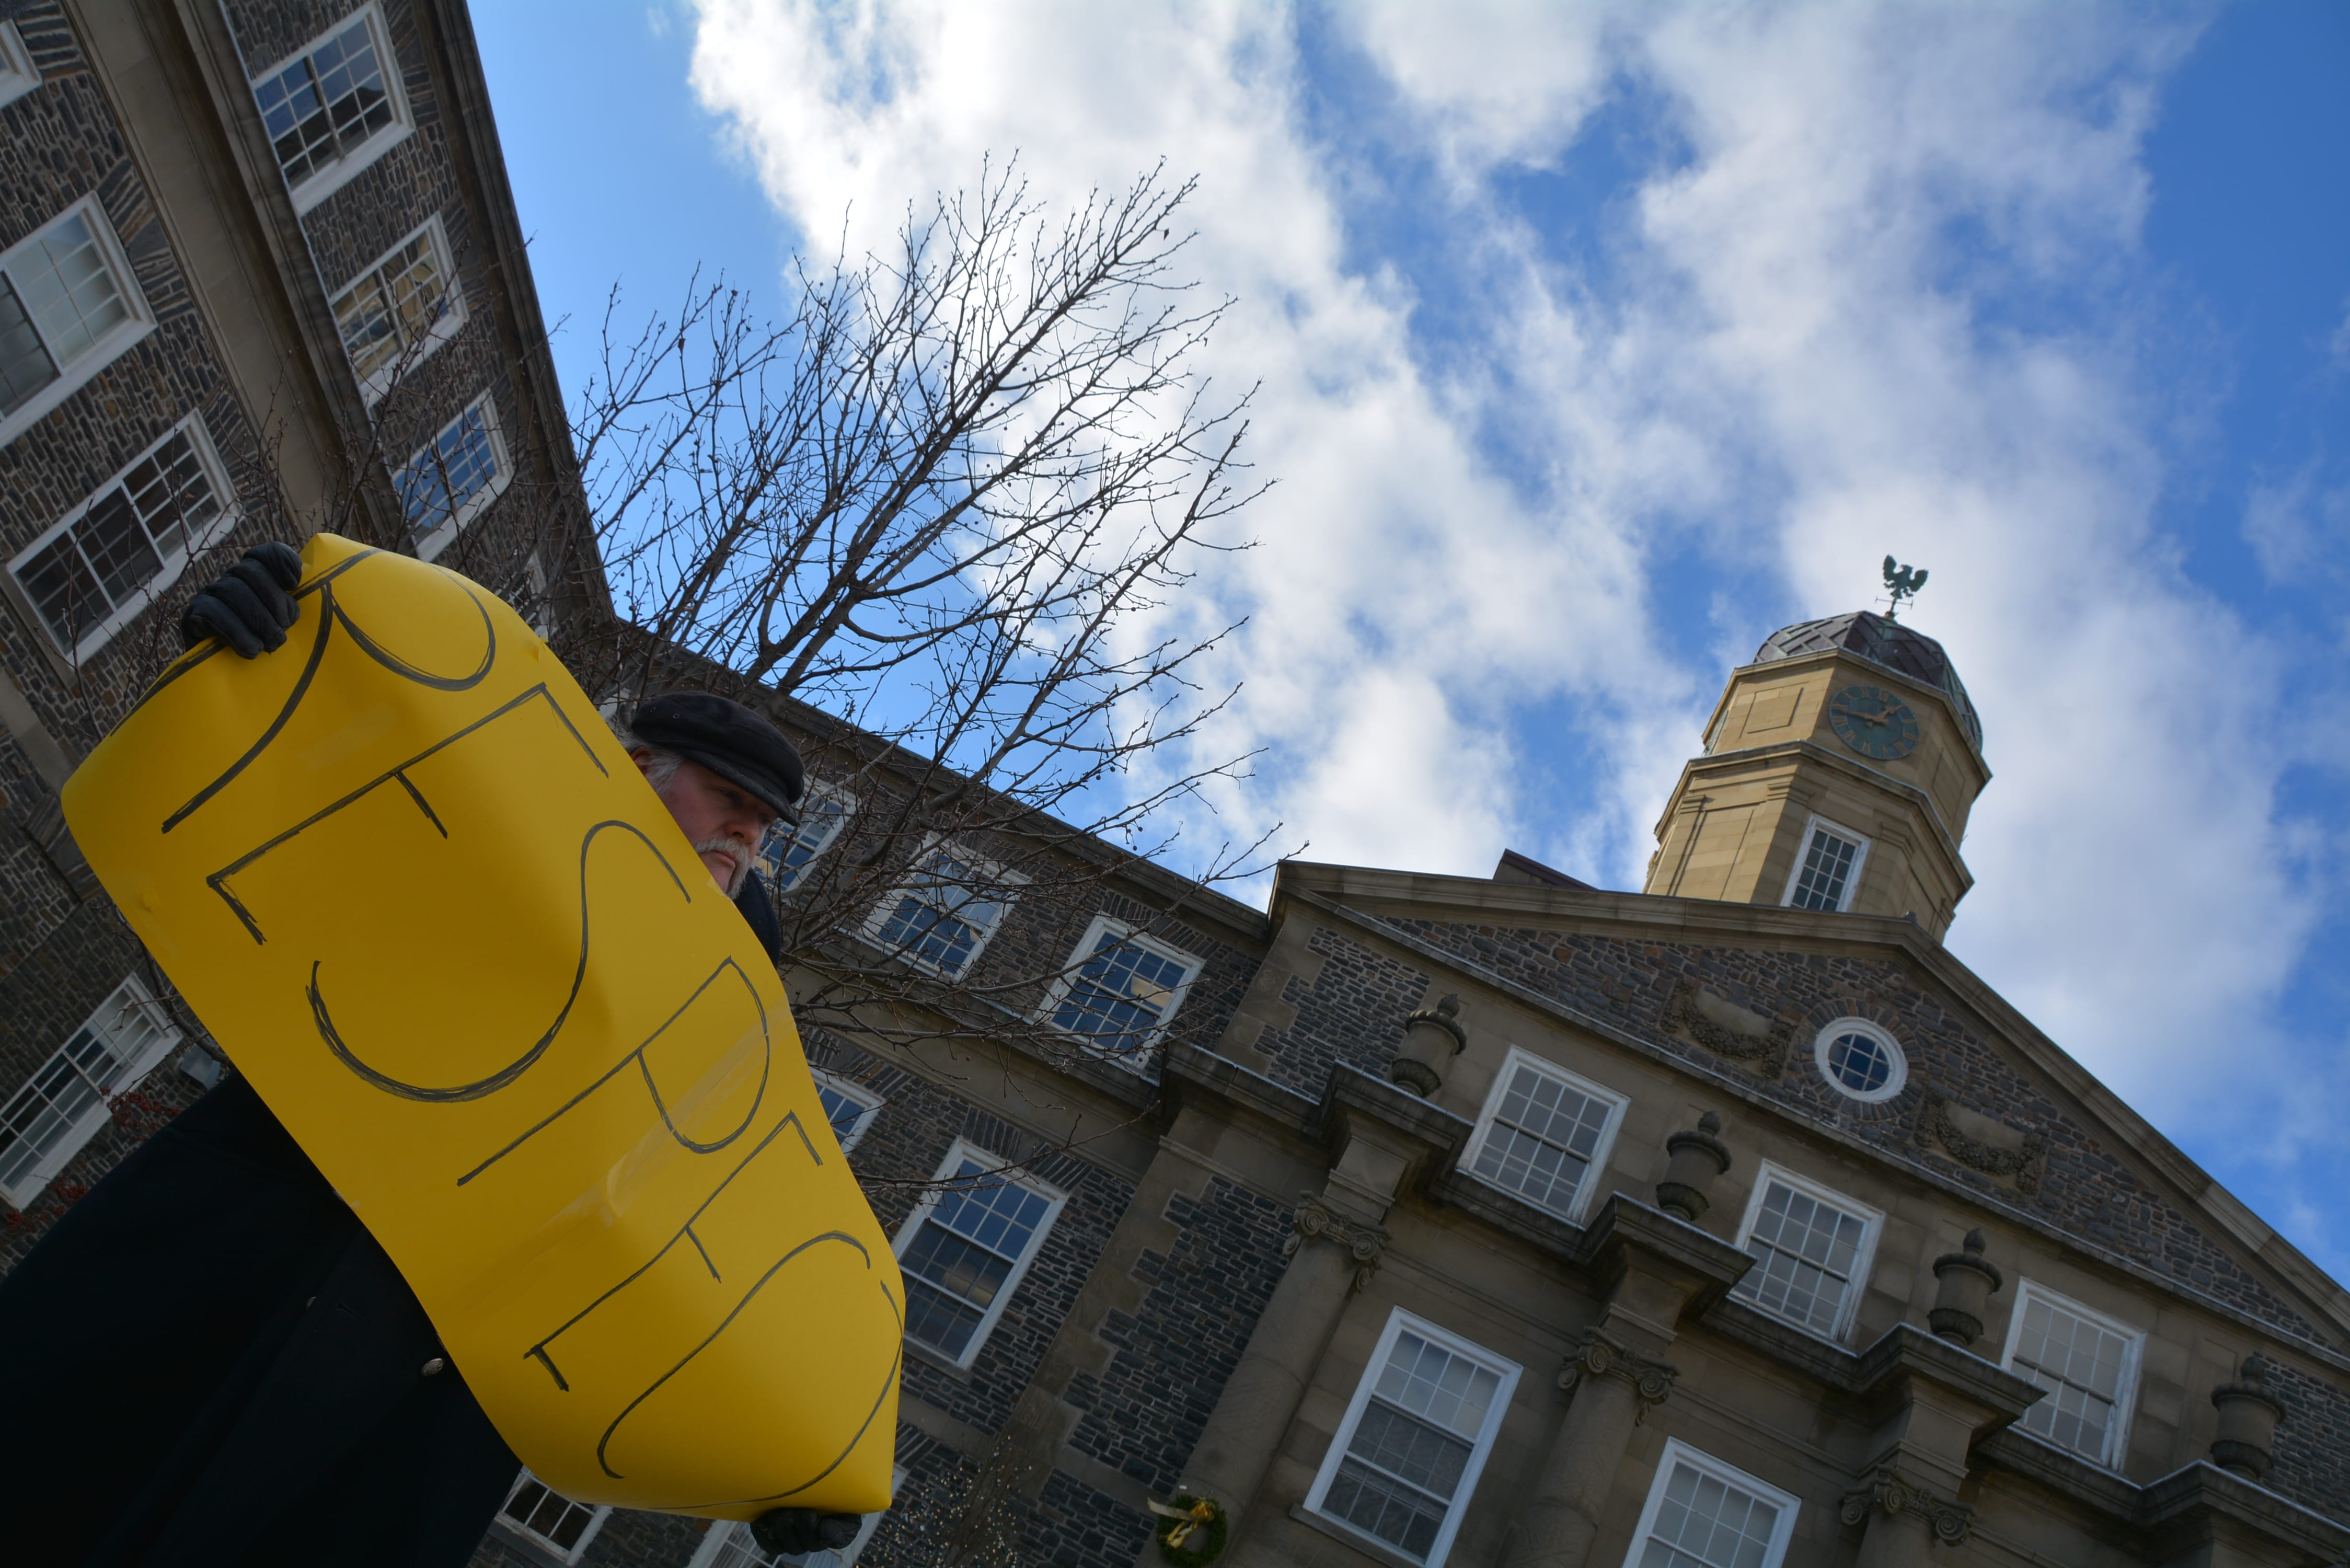 Senate discipline debate on Dalhousie dentistry scandal delayed